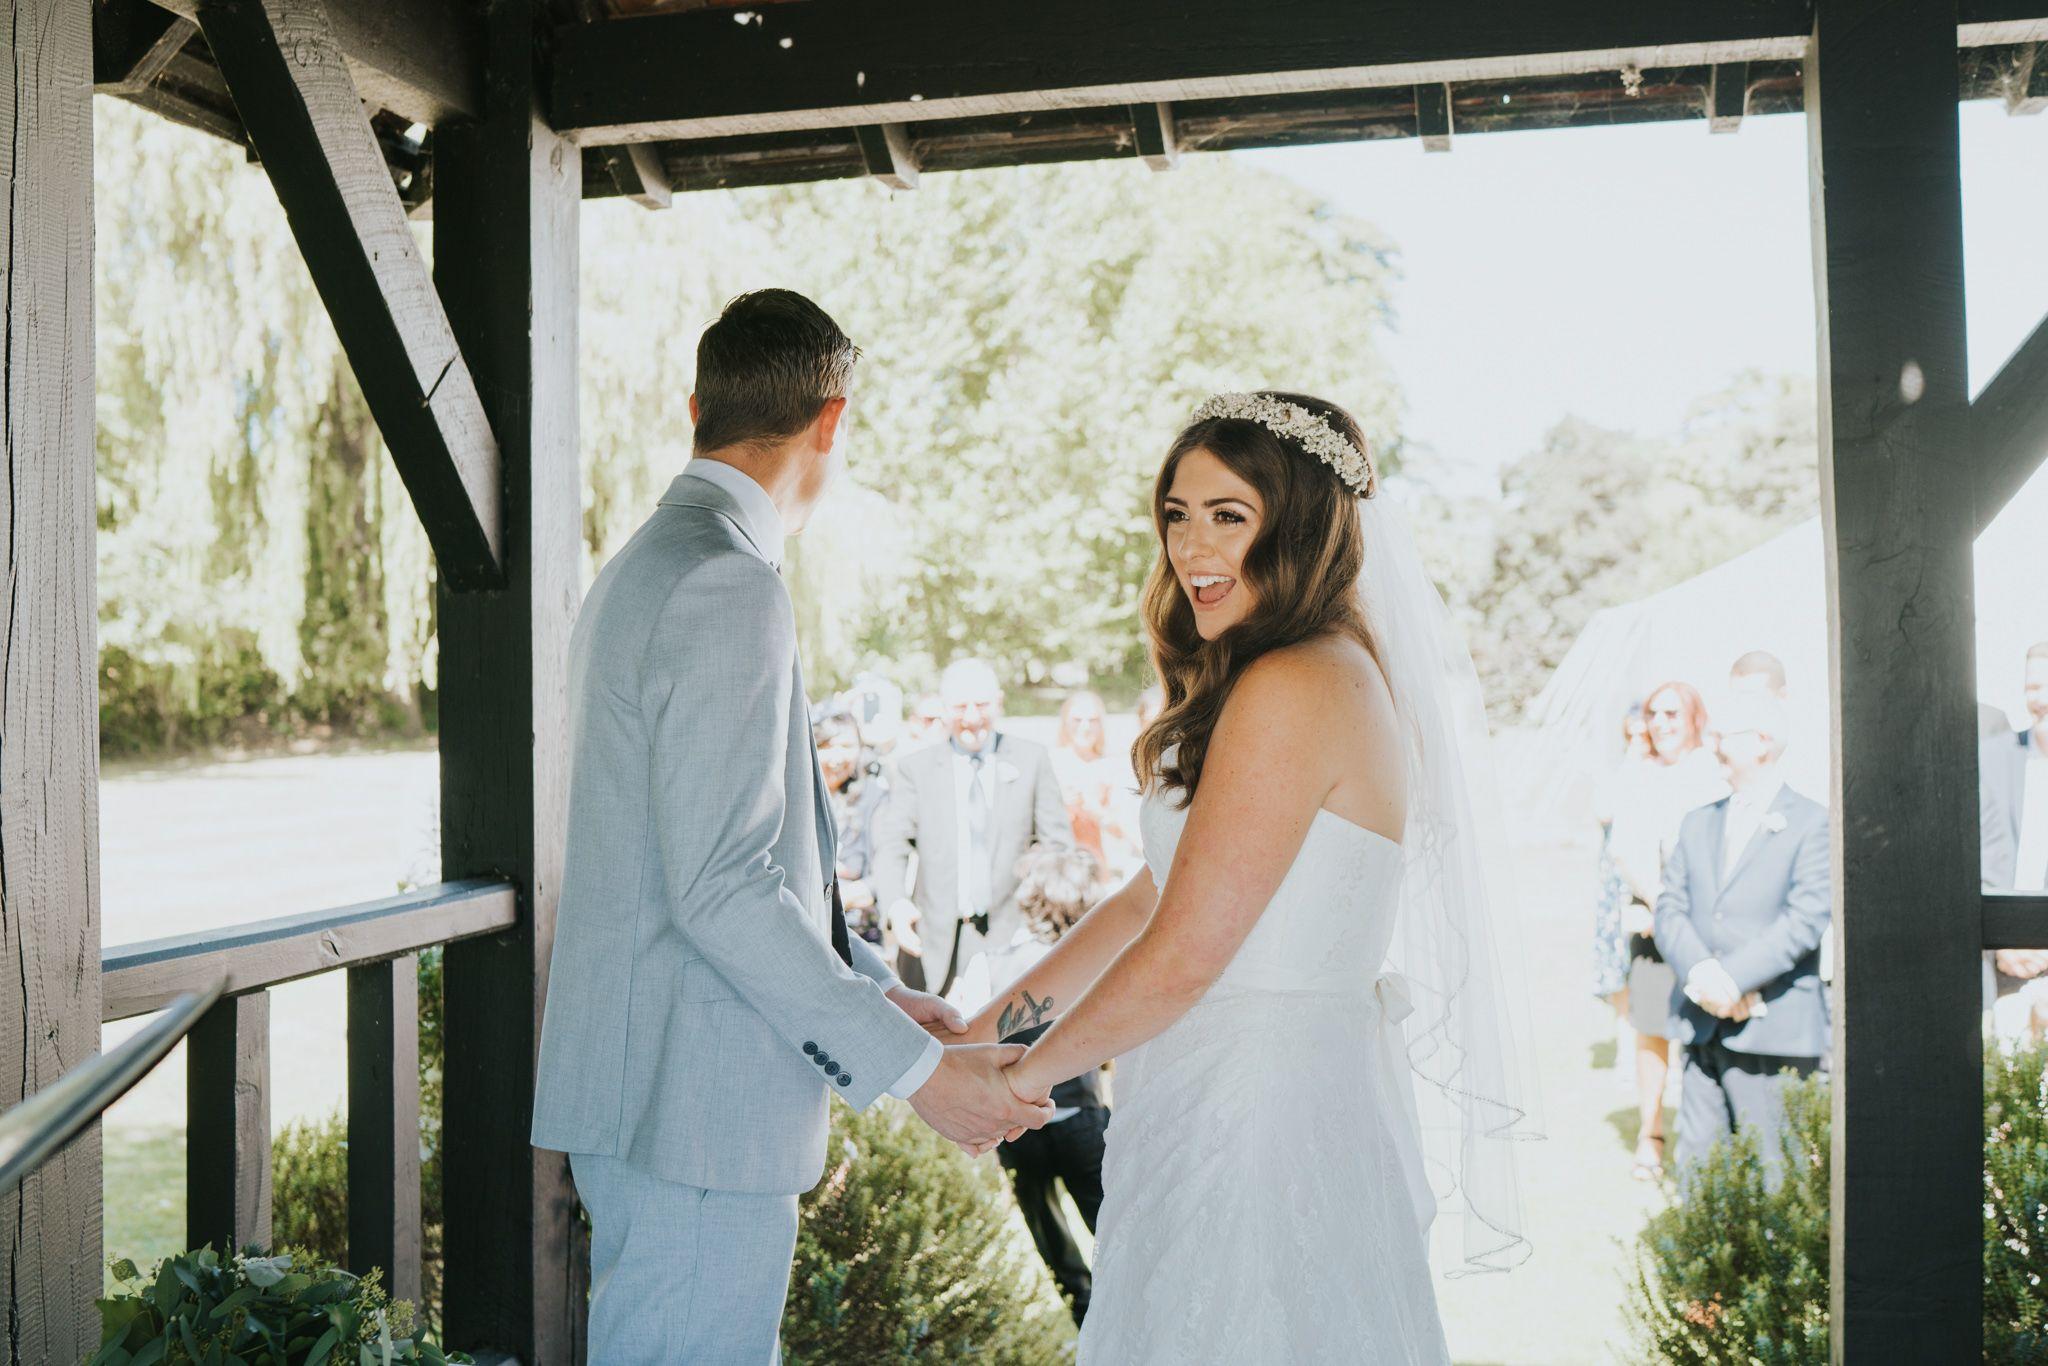 Outdoor boho diy wedding ceremony at prested hall essex wedding